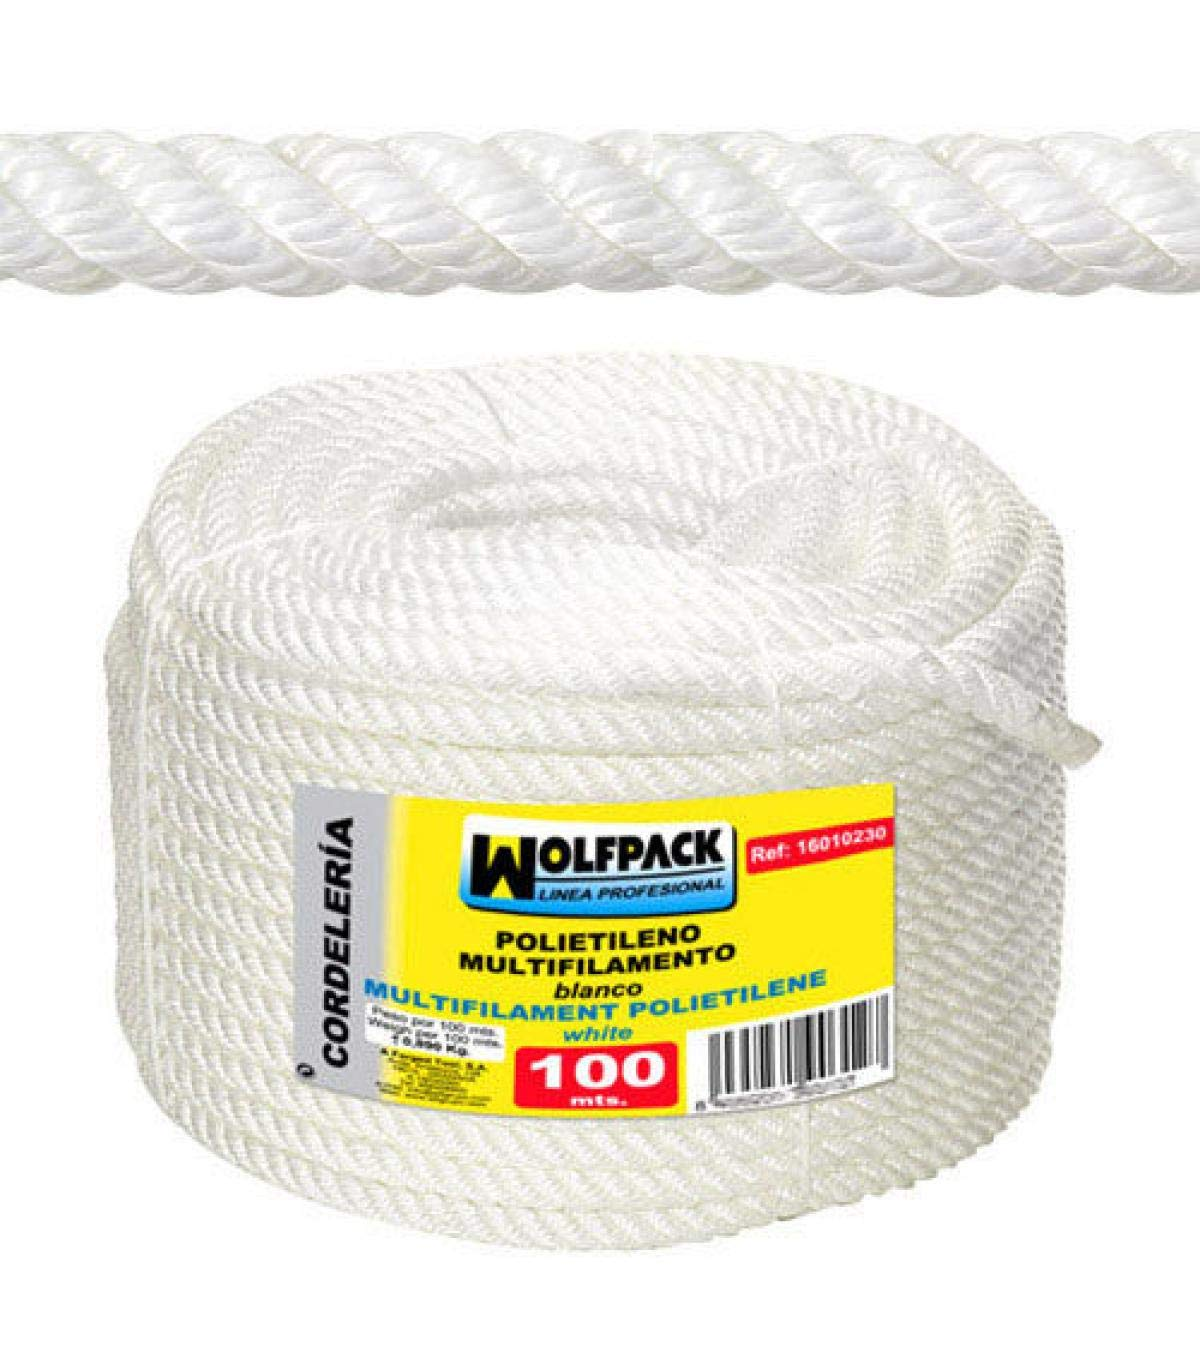 polipropileno, 100 m x 6 mm Wolfpack 16010205 Rollo cuerda multifilamento